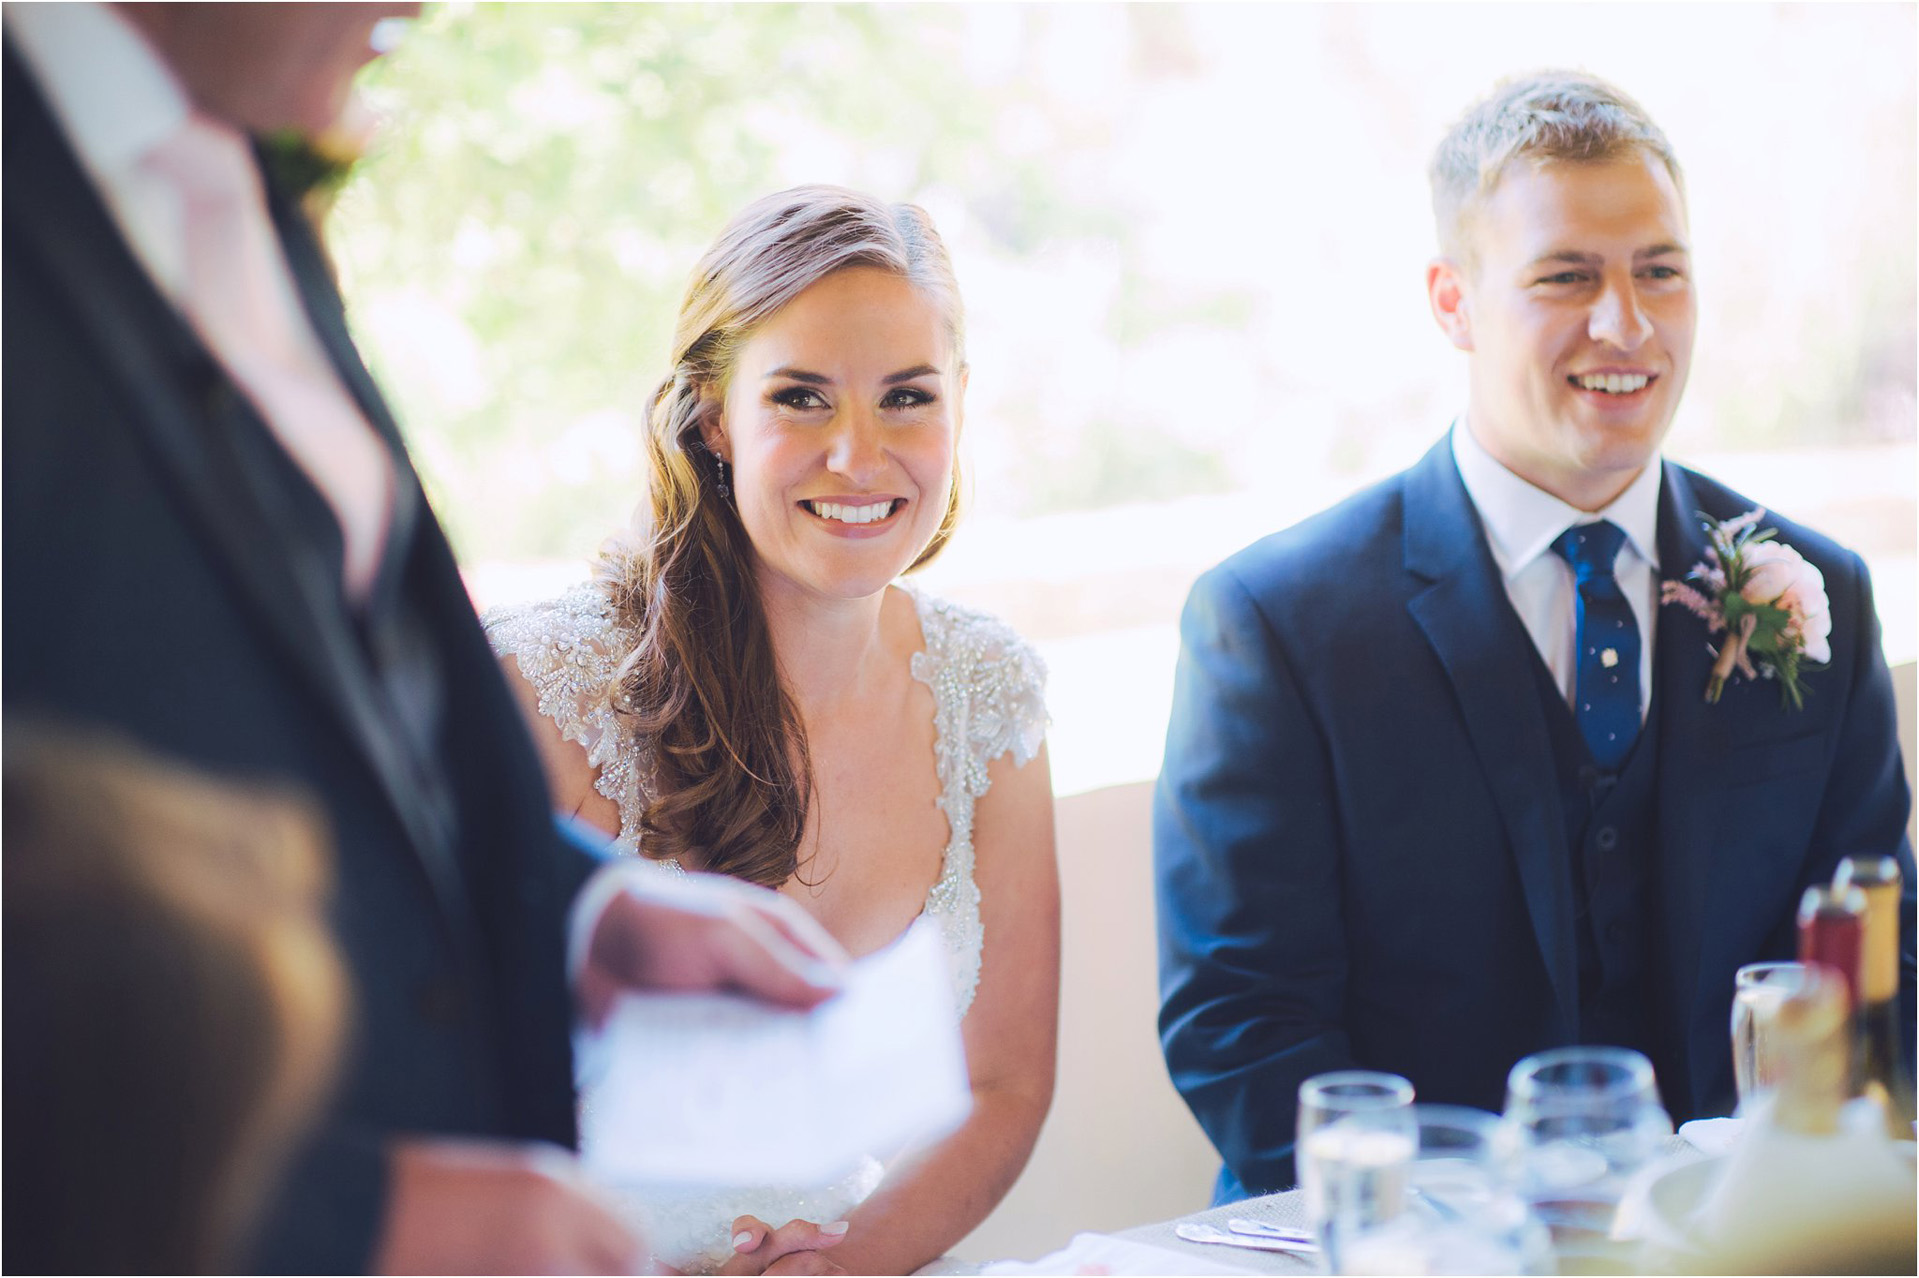 Simon biffen wedding photography 0110